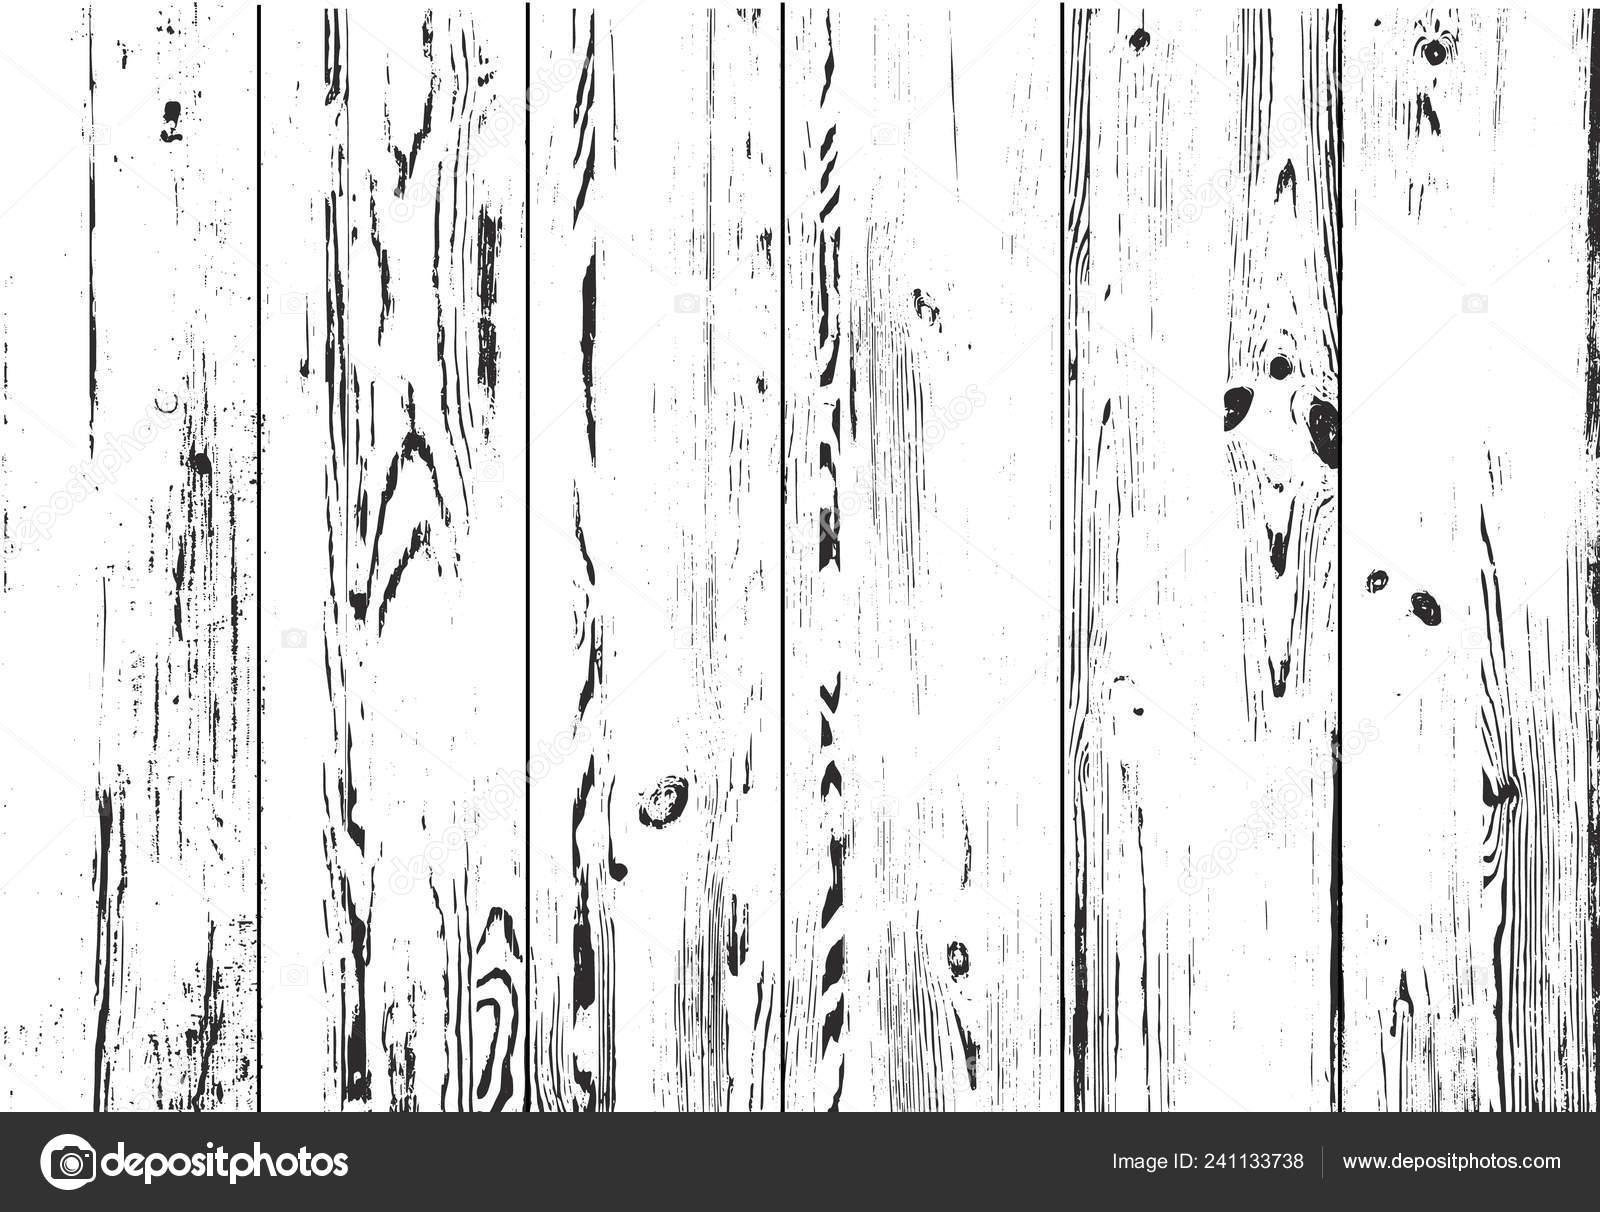 Distressed Wooden Planks Overlay Texture Vector Illustration Wood Grain Background Stock Vector C Ita Tinta 241133738